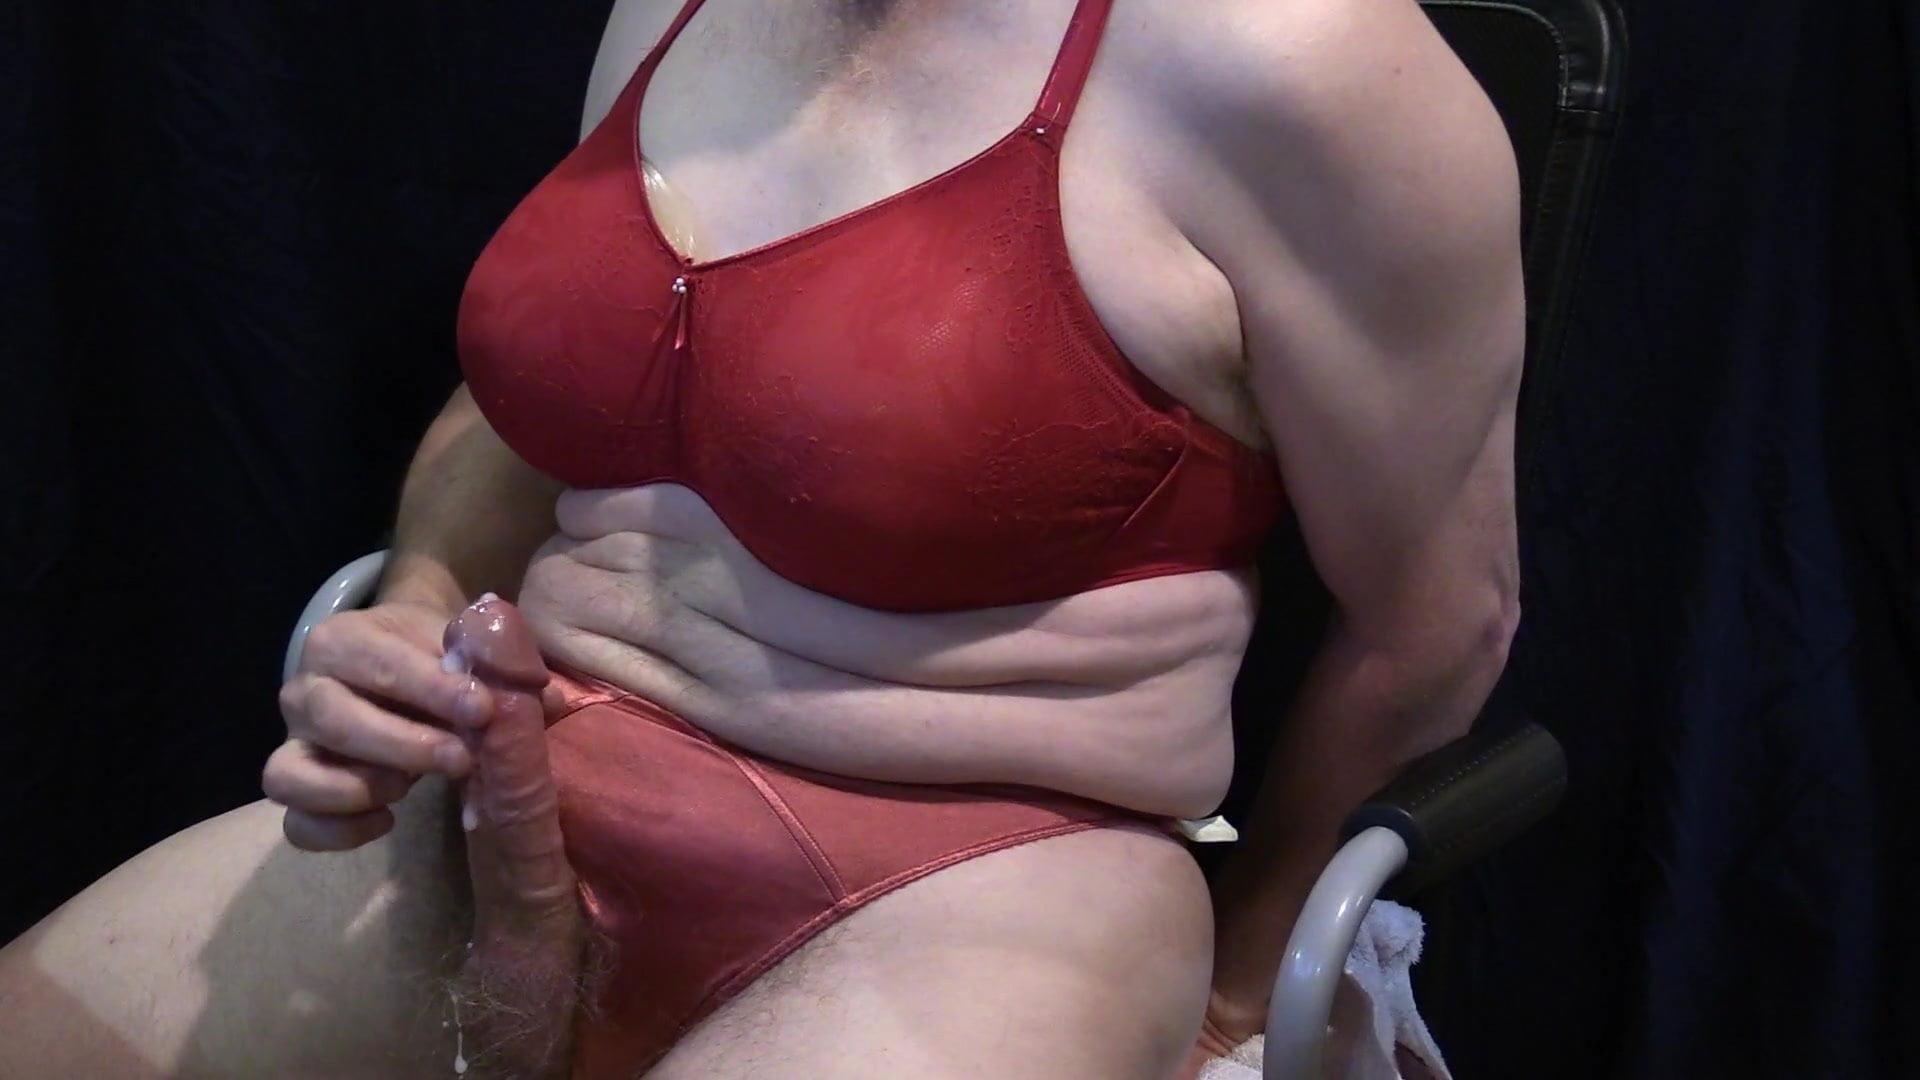 Crossdress Cumshot – Red Bra and Panty